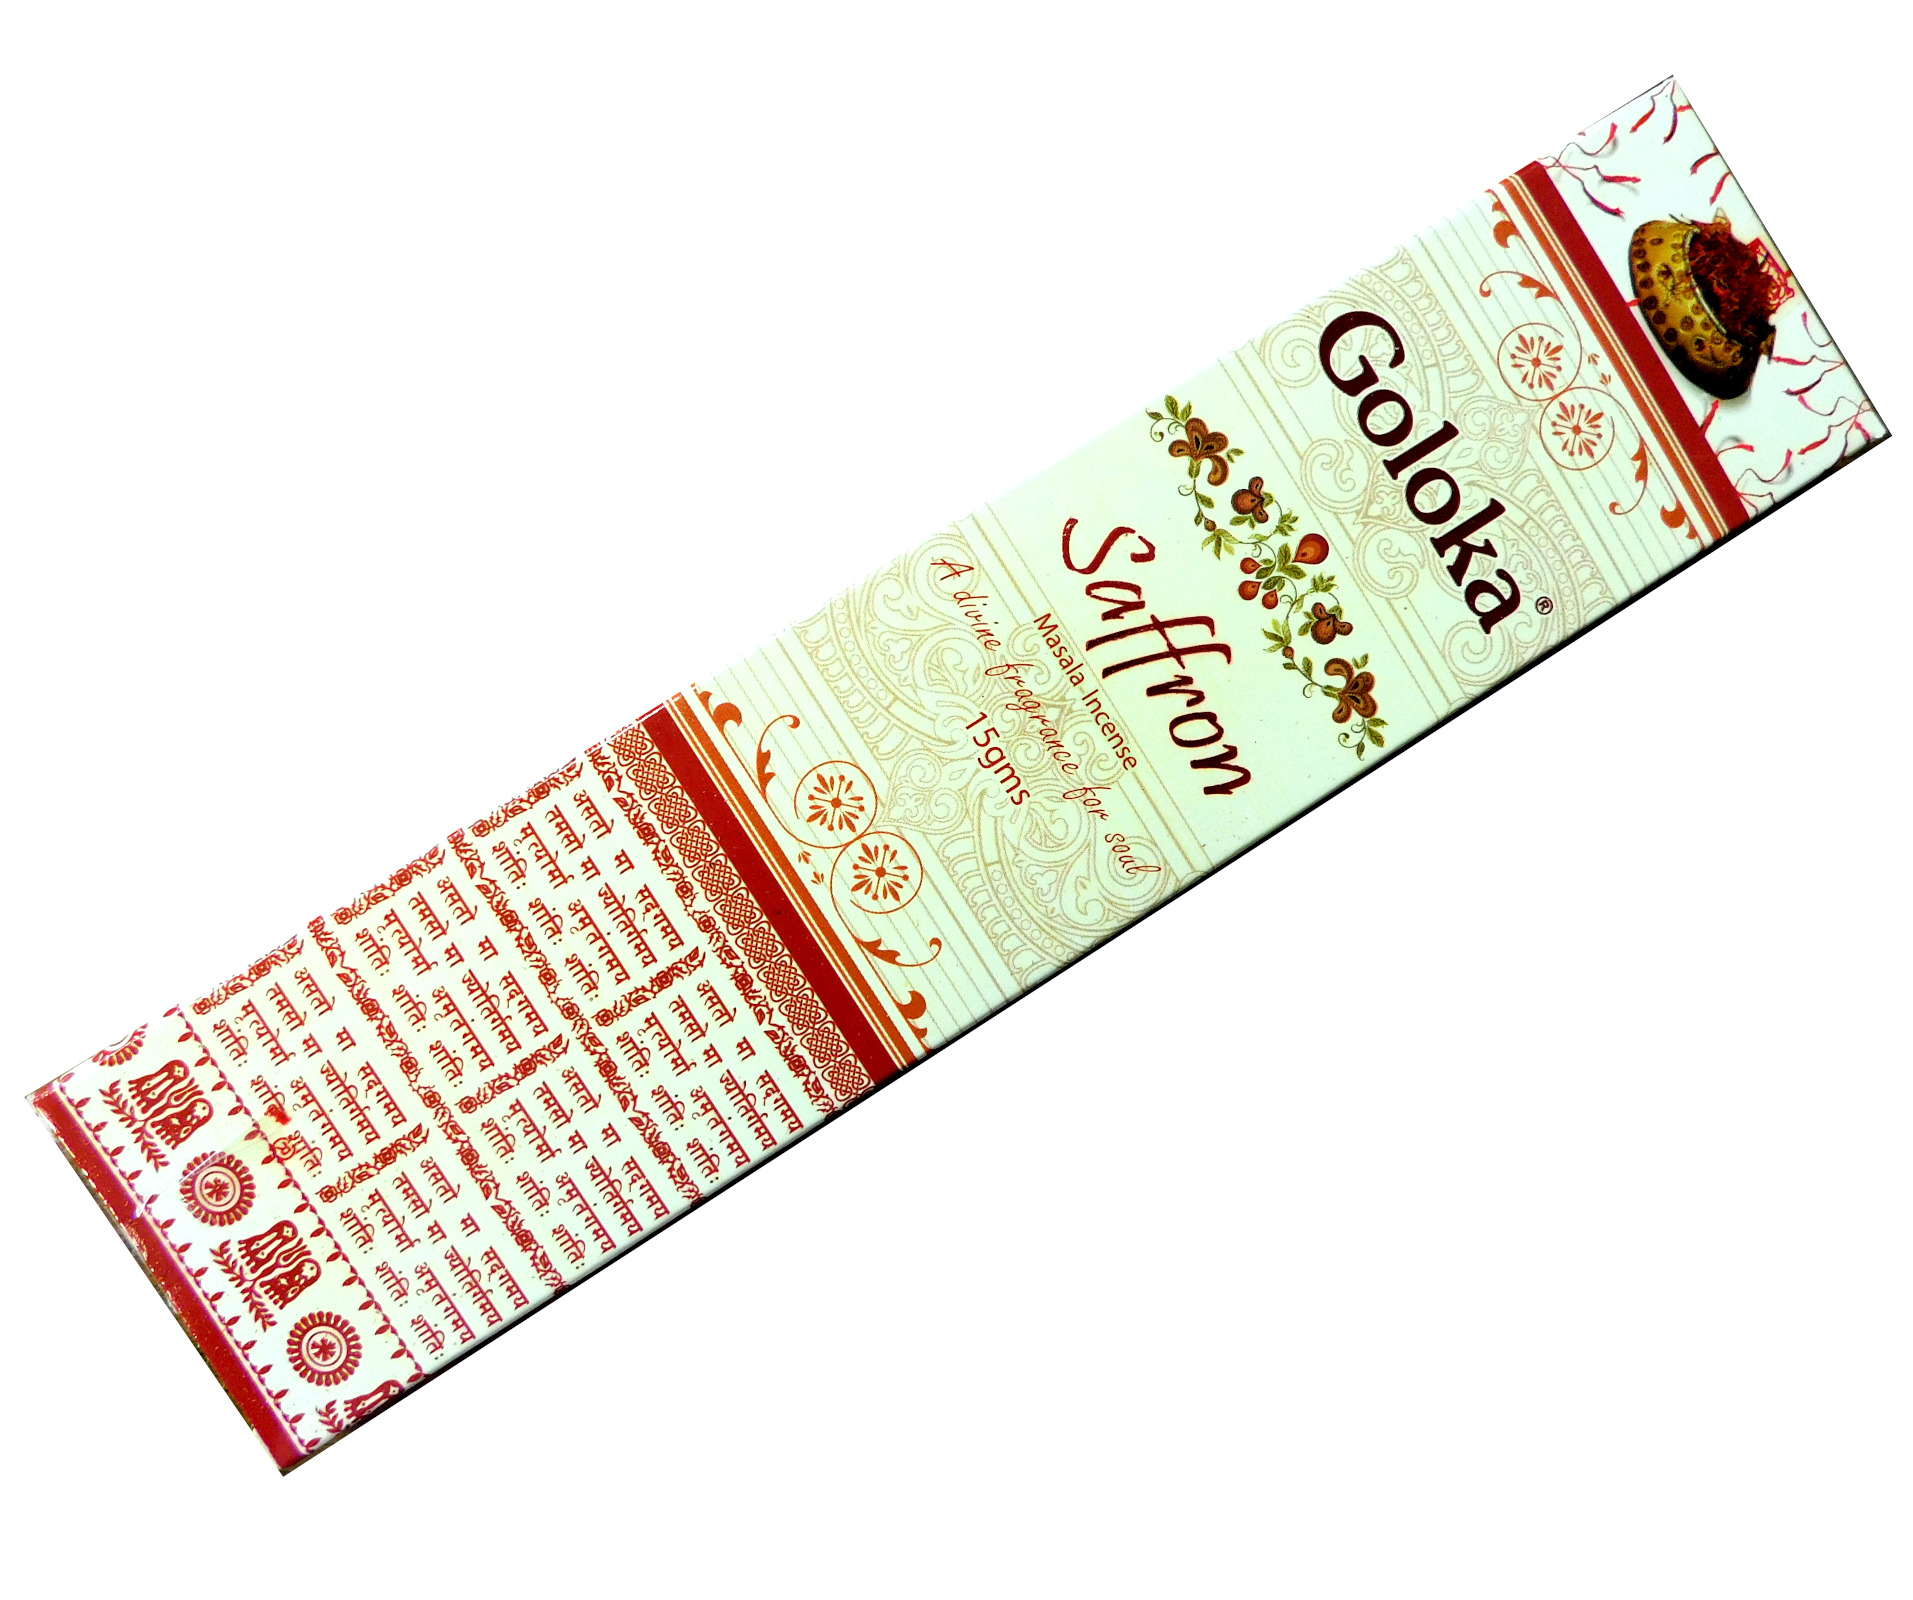 Räucherstäbchen Goloka Saffron